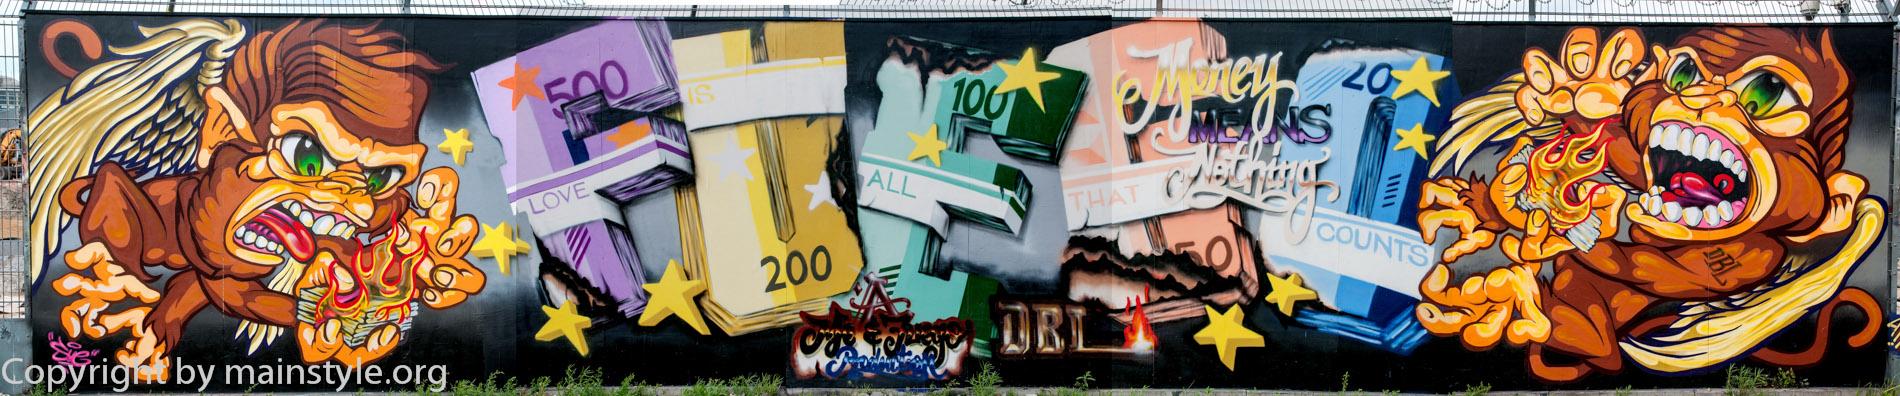 Frankfurt_Nacht_der_Museen_Graffiti_EZB_2013_Part3_full--10